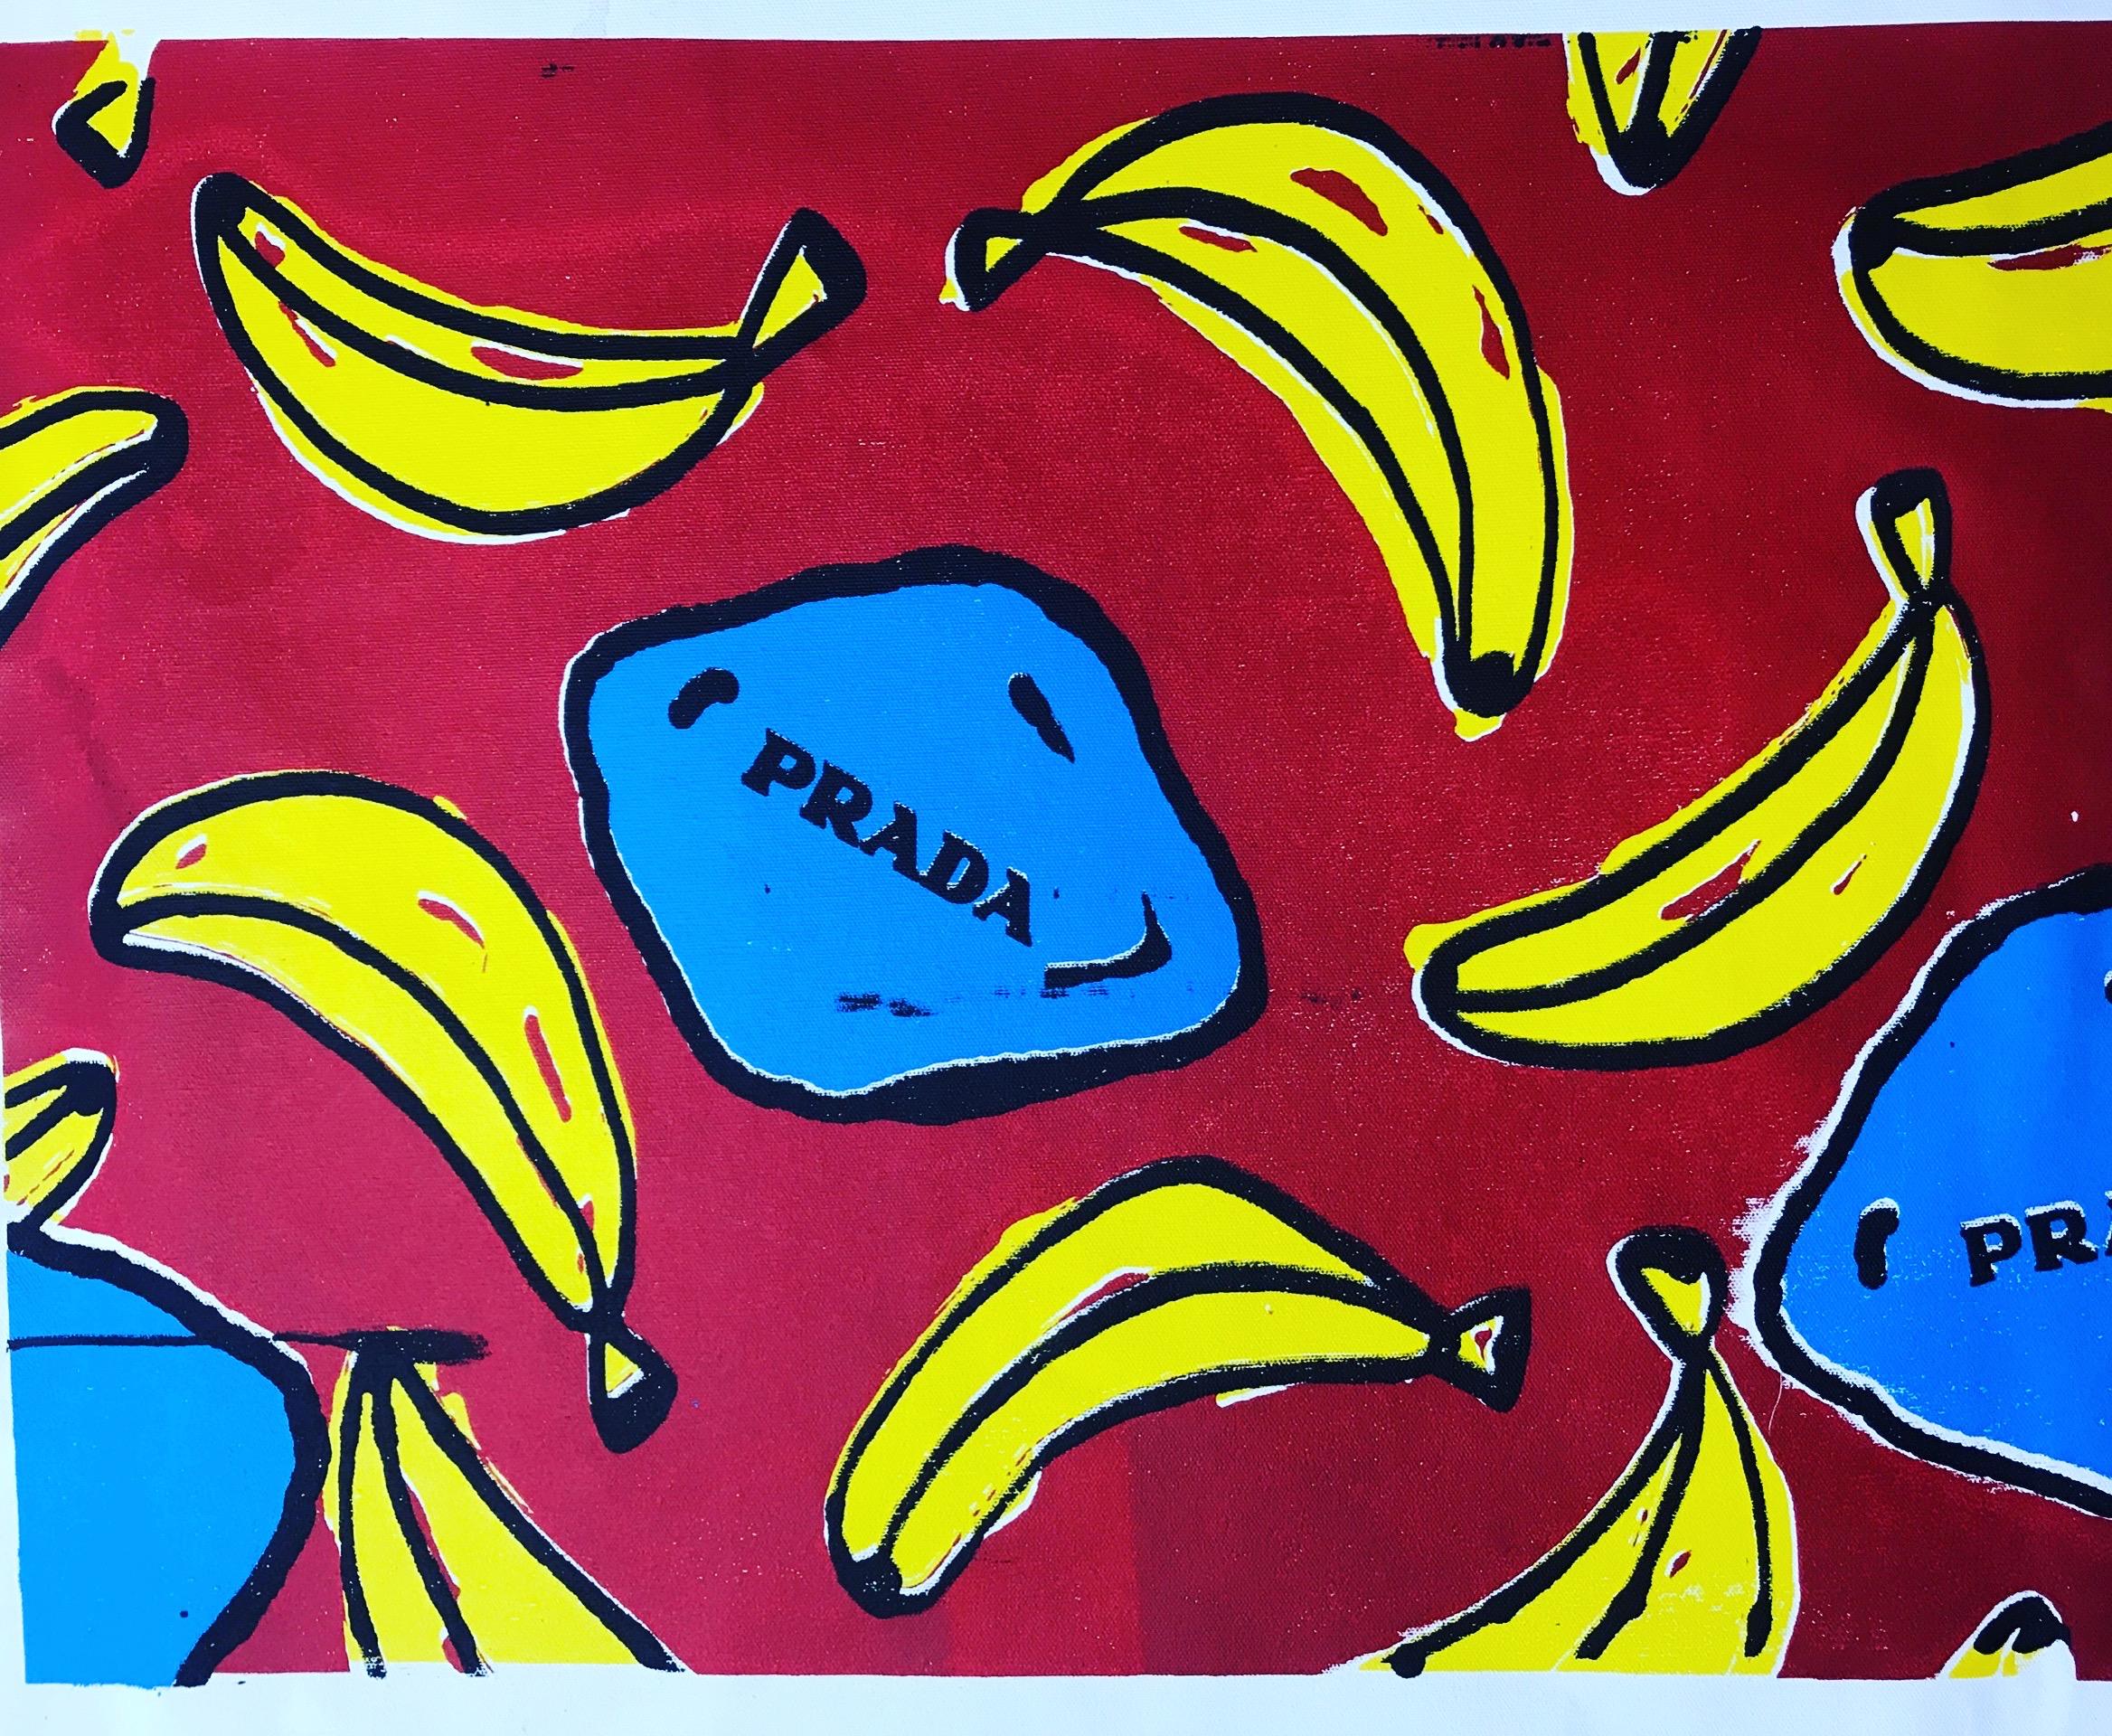 BIG BANANA - 18 x 24 Acrylic on CanvasBuyer Inquiry